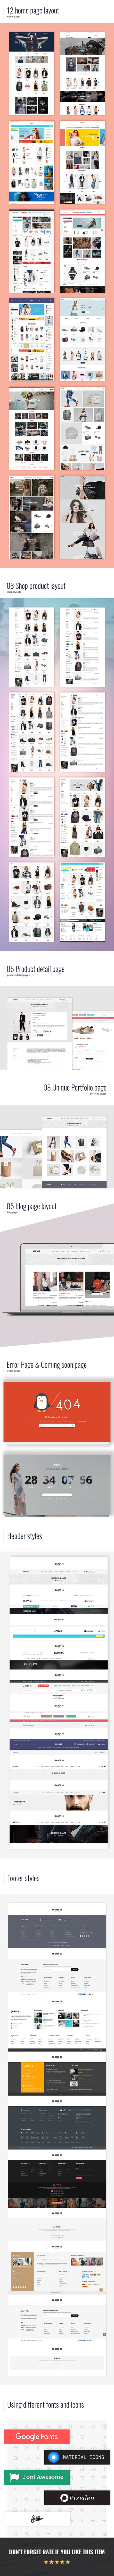 Jarvis - Multipurpose eCommerce PSD template - 1